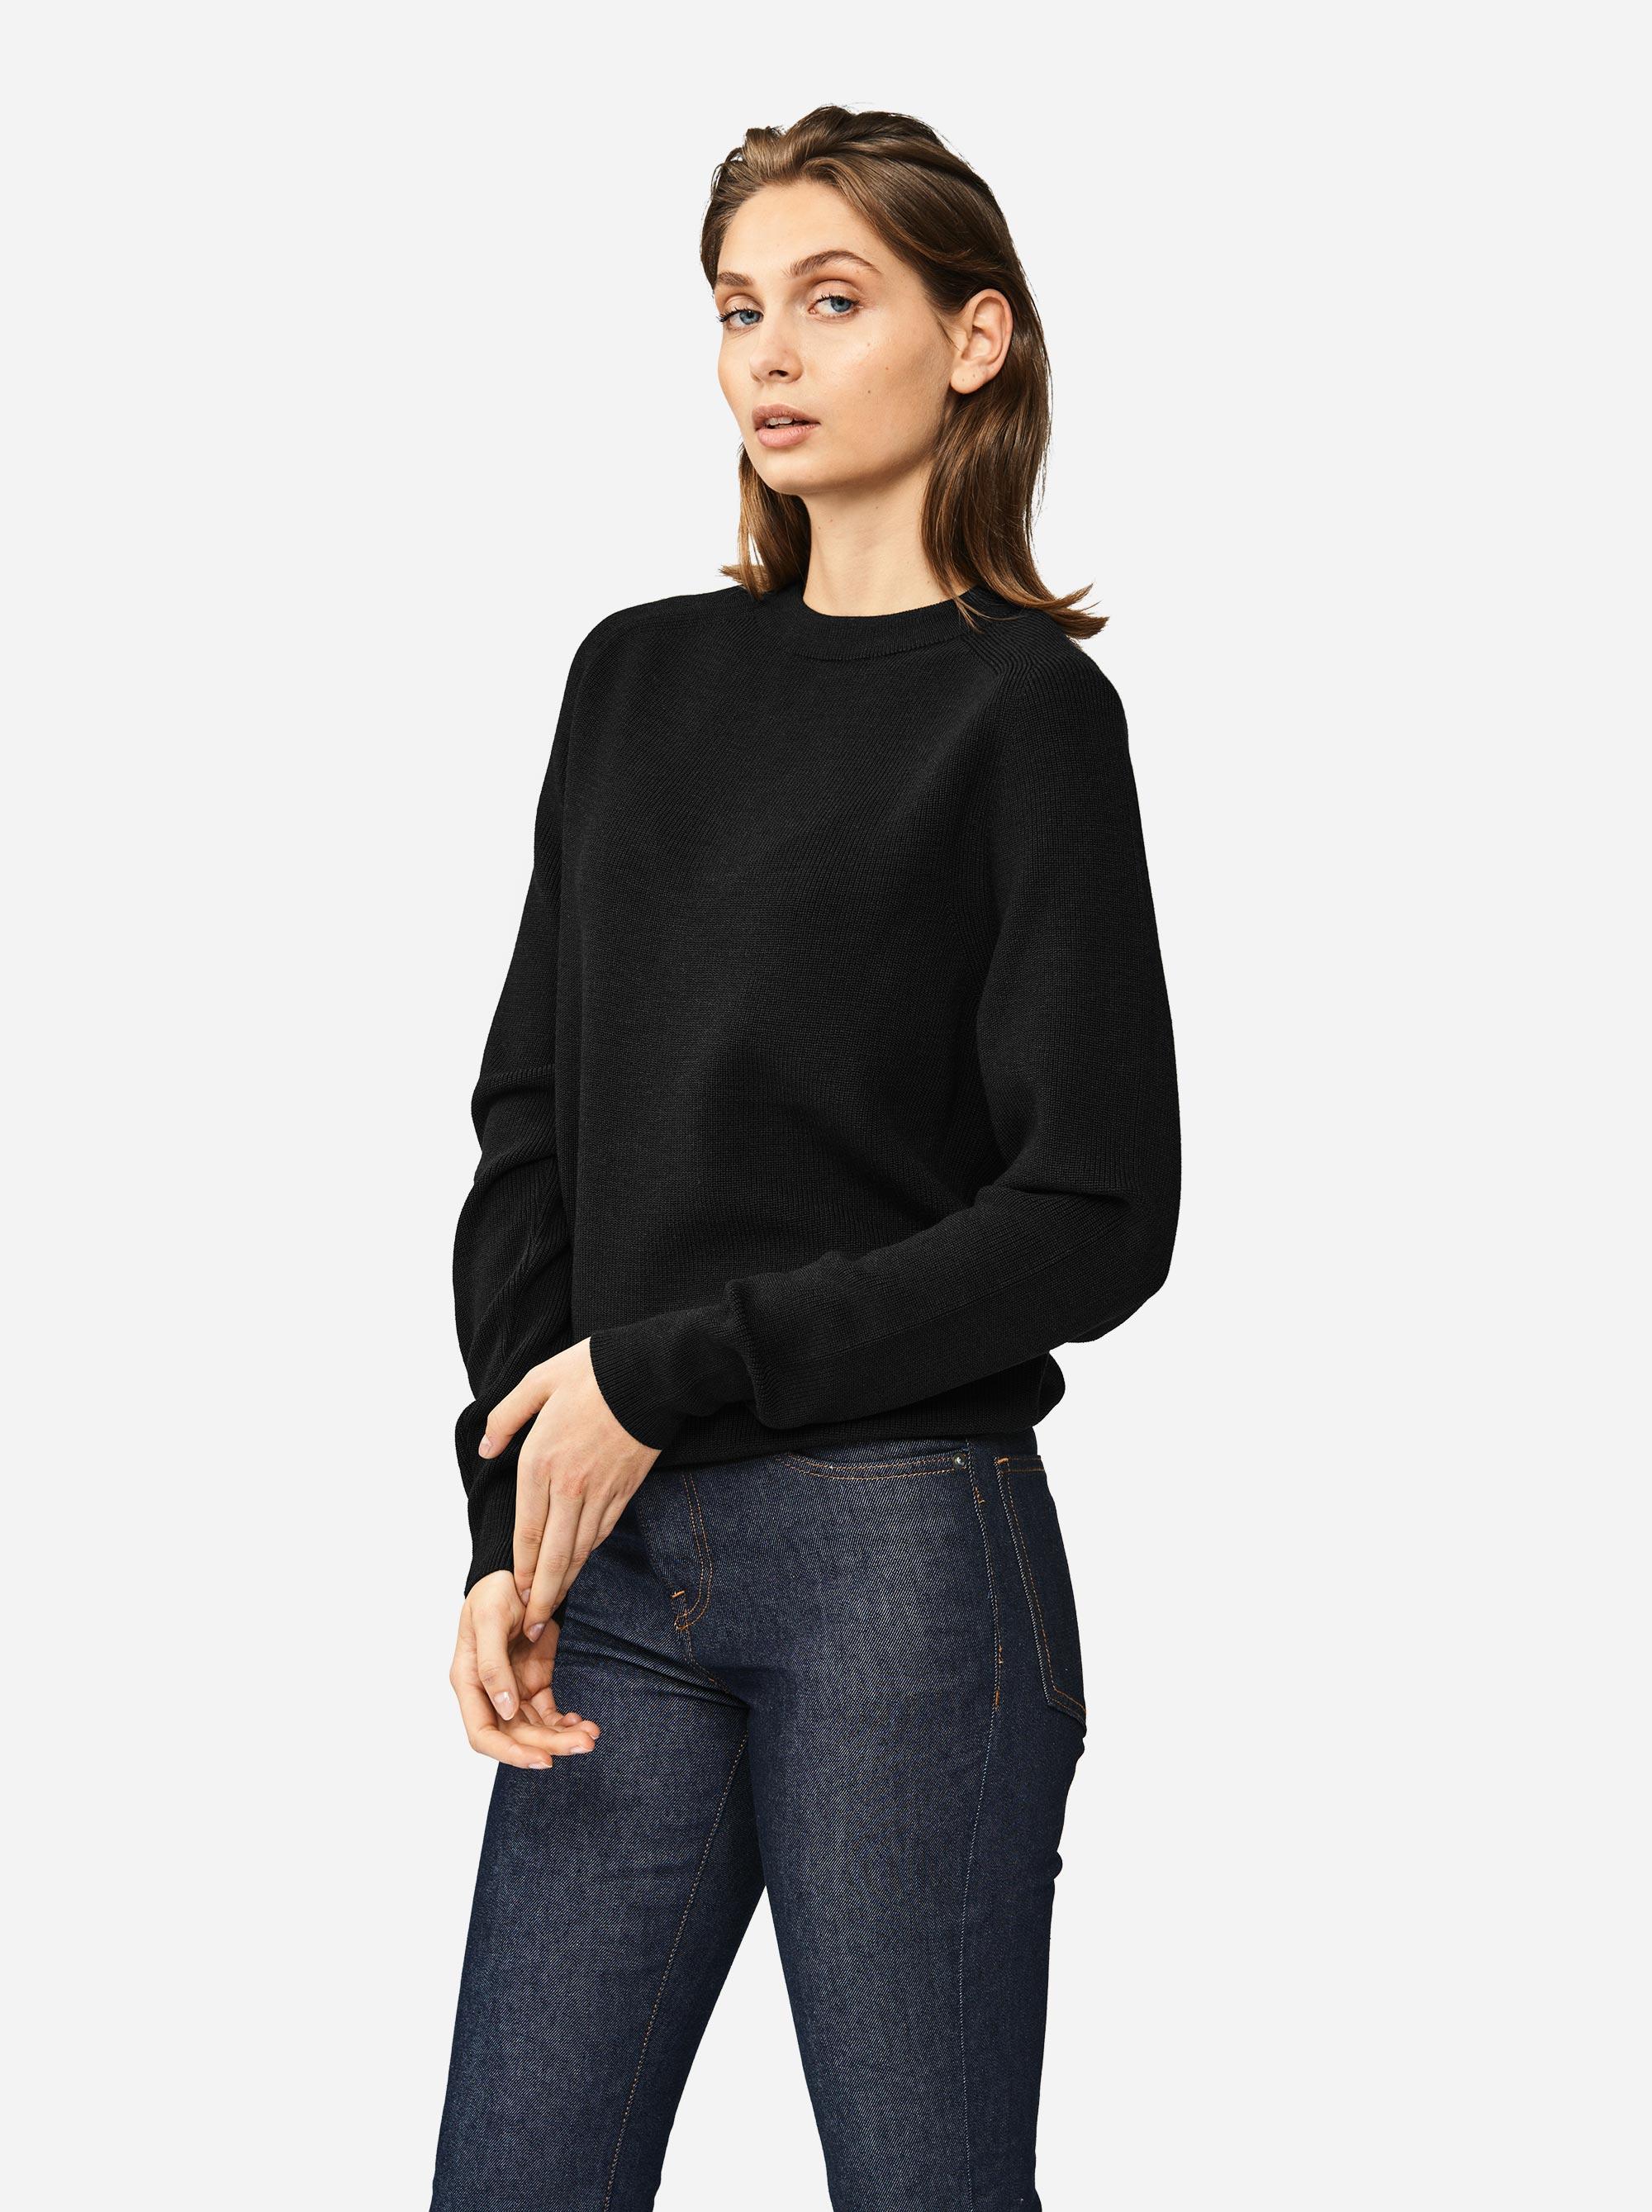 Teym - Crewneck - The Merino Sweater - Women - Black - 5